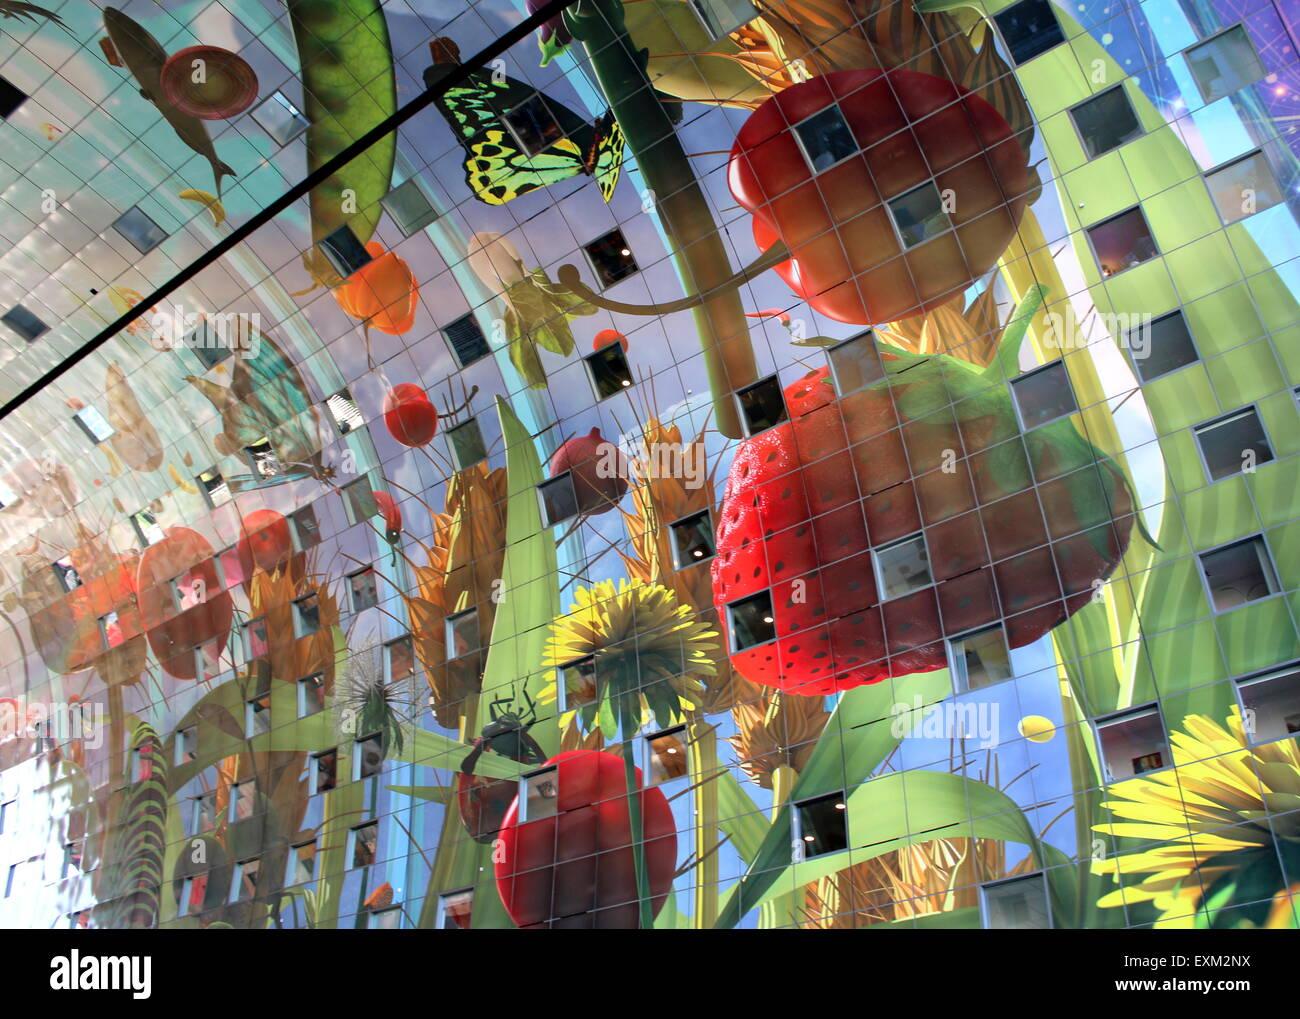 Colourful interior of the Rotterdam Markthal (Rotterdam Market hall).  Artwork by Arno Coenen - Cornucopia, Hoorn Stock Photo